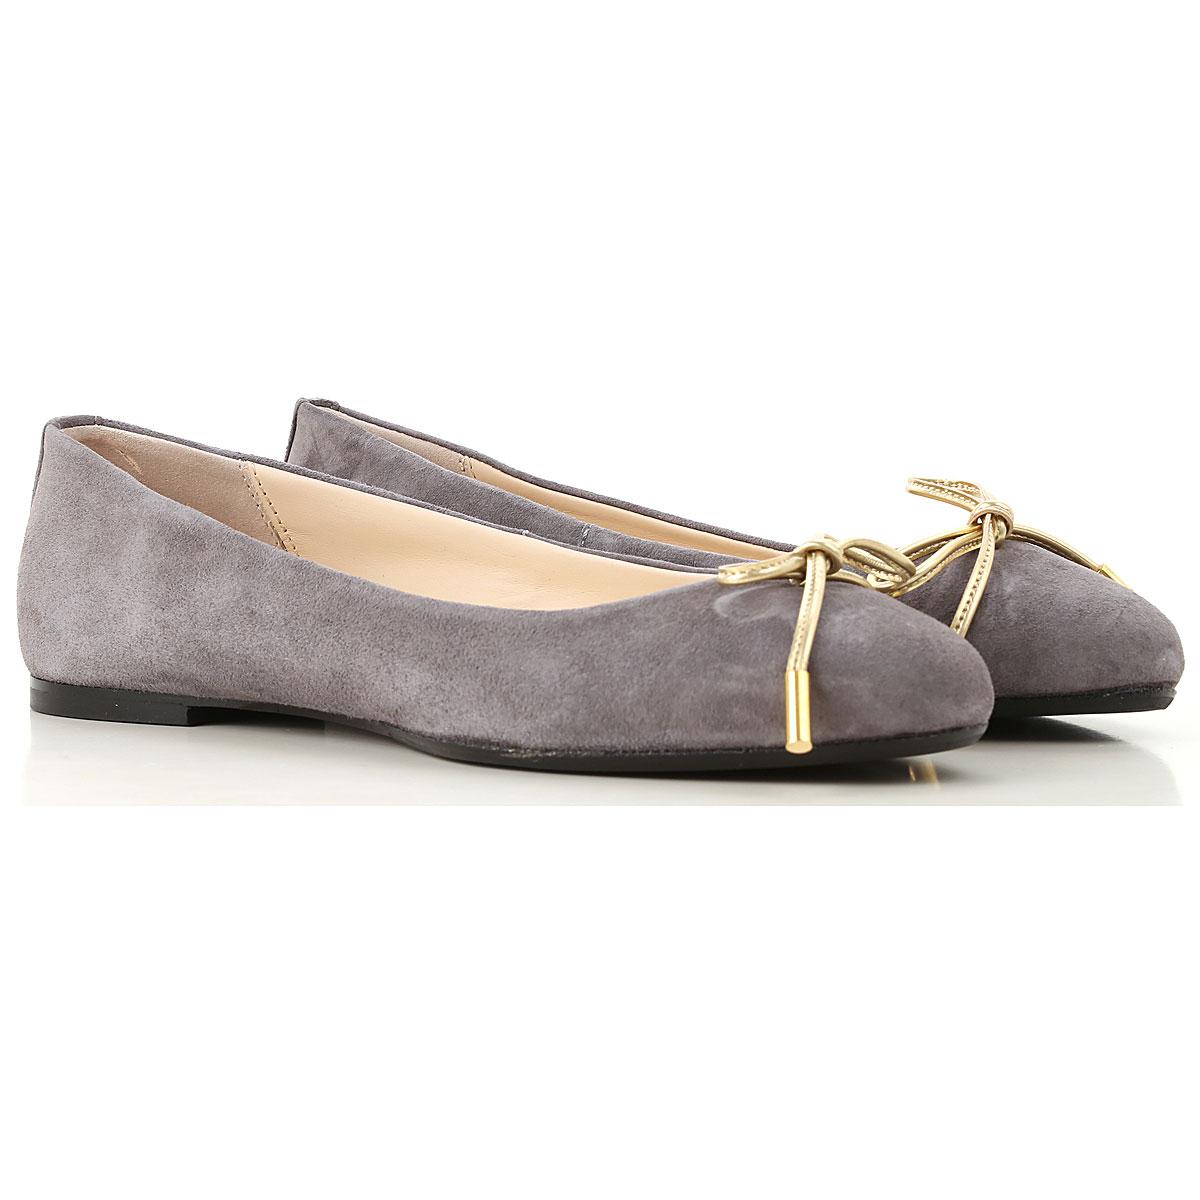 Image of Anna Baiguera Ballet Flats Ballerina Shoes for Women, Mouse Grey, suede, 2017, 10 11 5 7 8